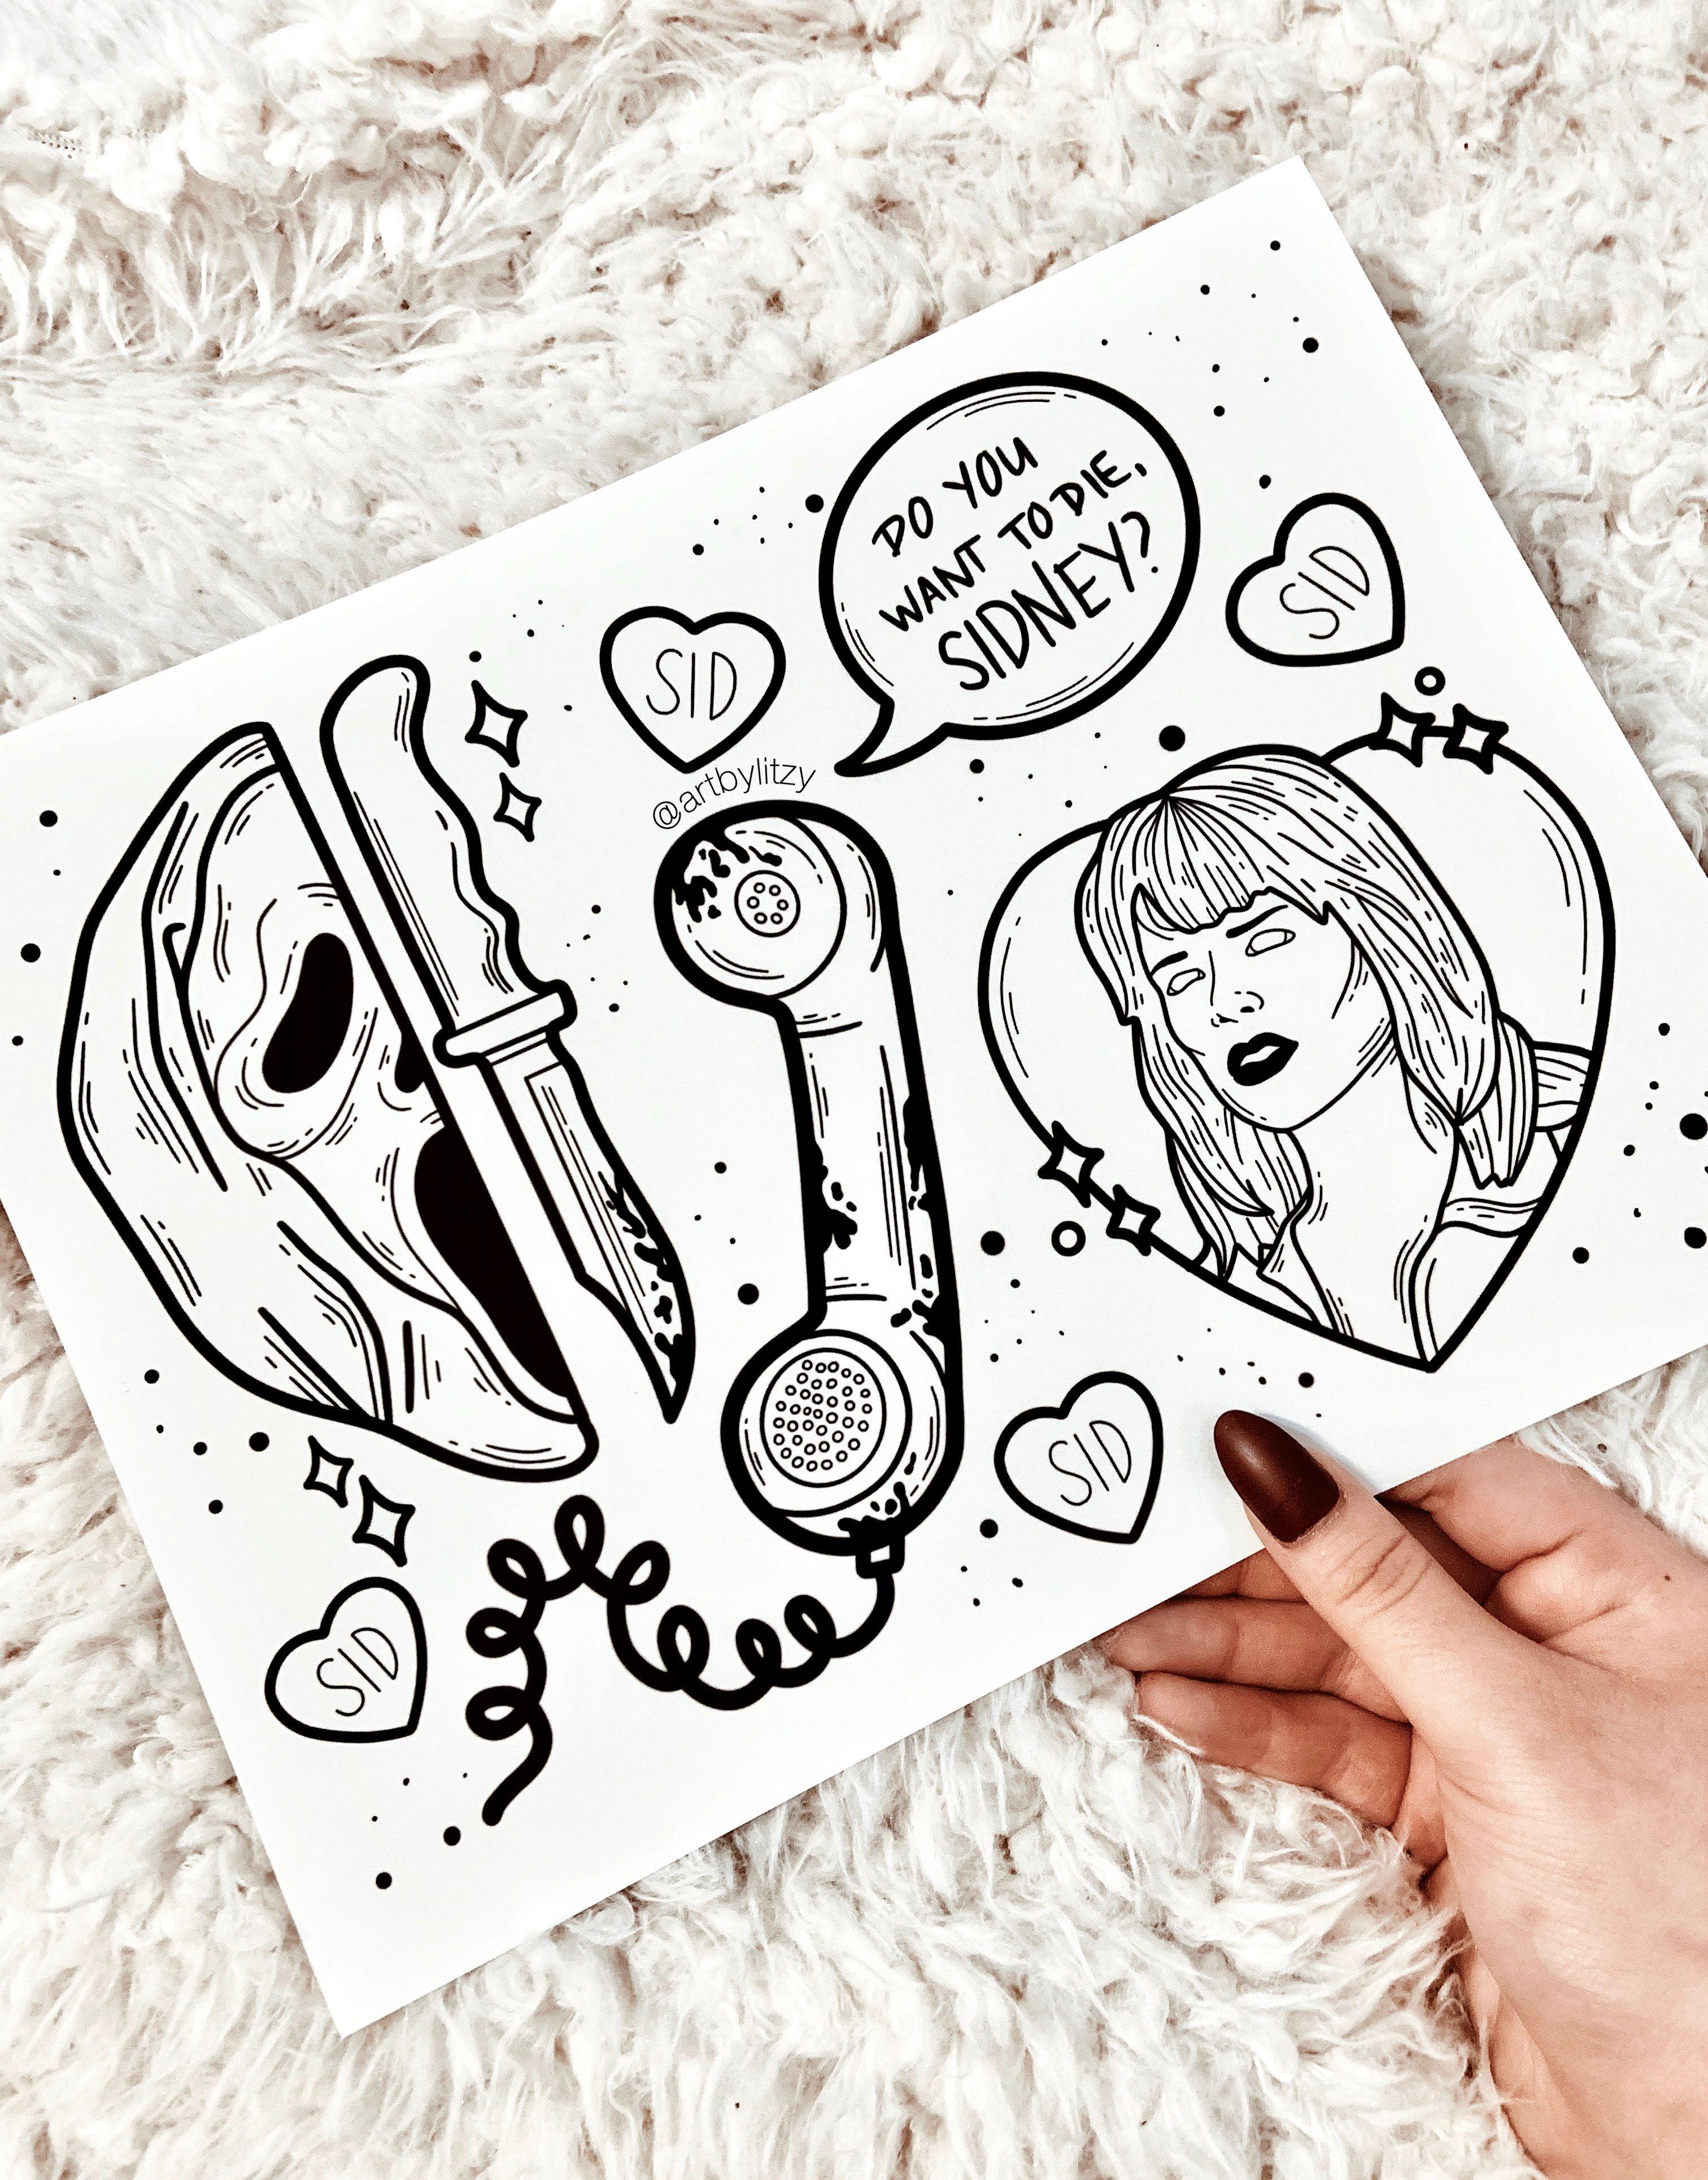 Ghostface Sidney Prescott Designs Ig Artbylitzy Flash Tattoo Sleeve Halloween Tattoos Doodle Tattoo